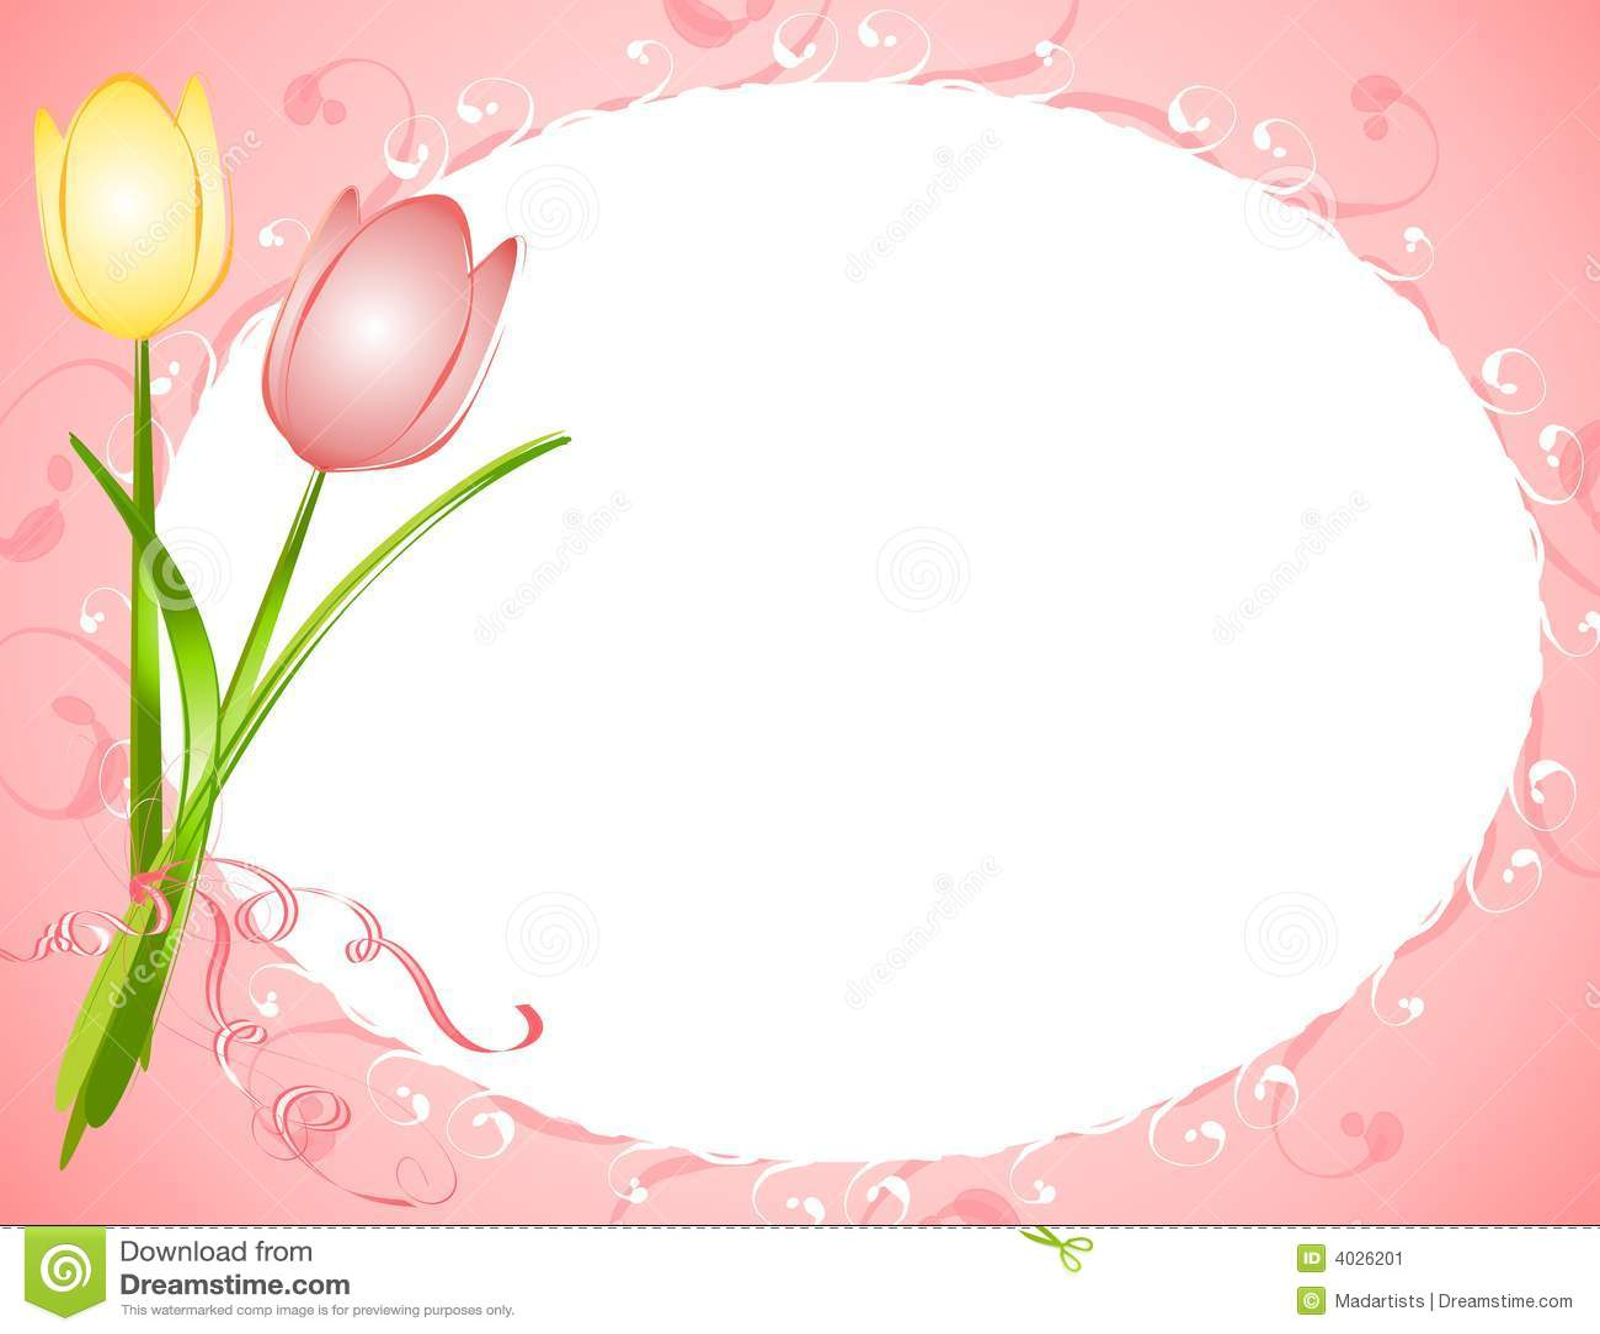 Pink oval tulips flower frame border illustration 4026201 megapixl mightylinksfo